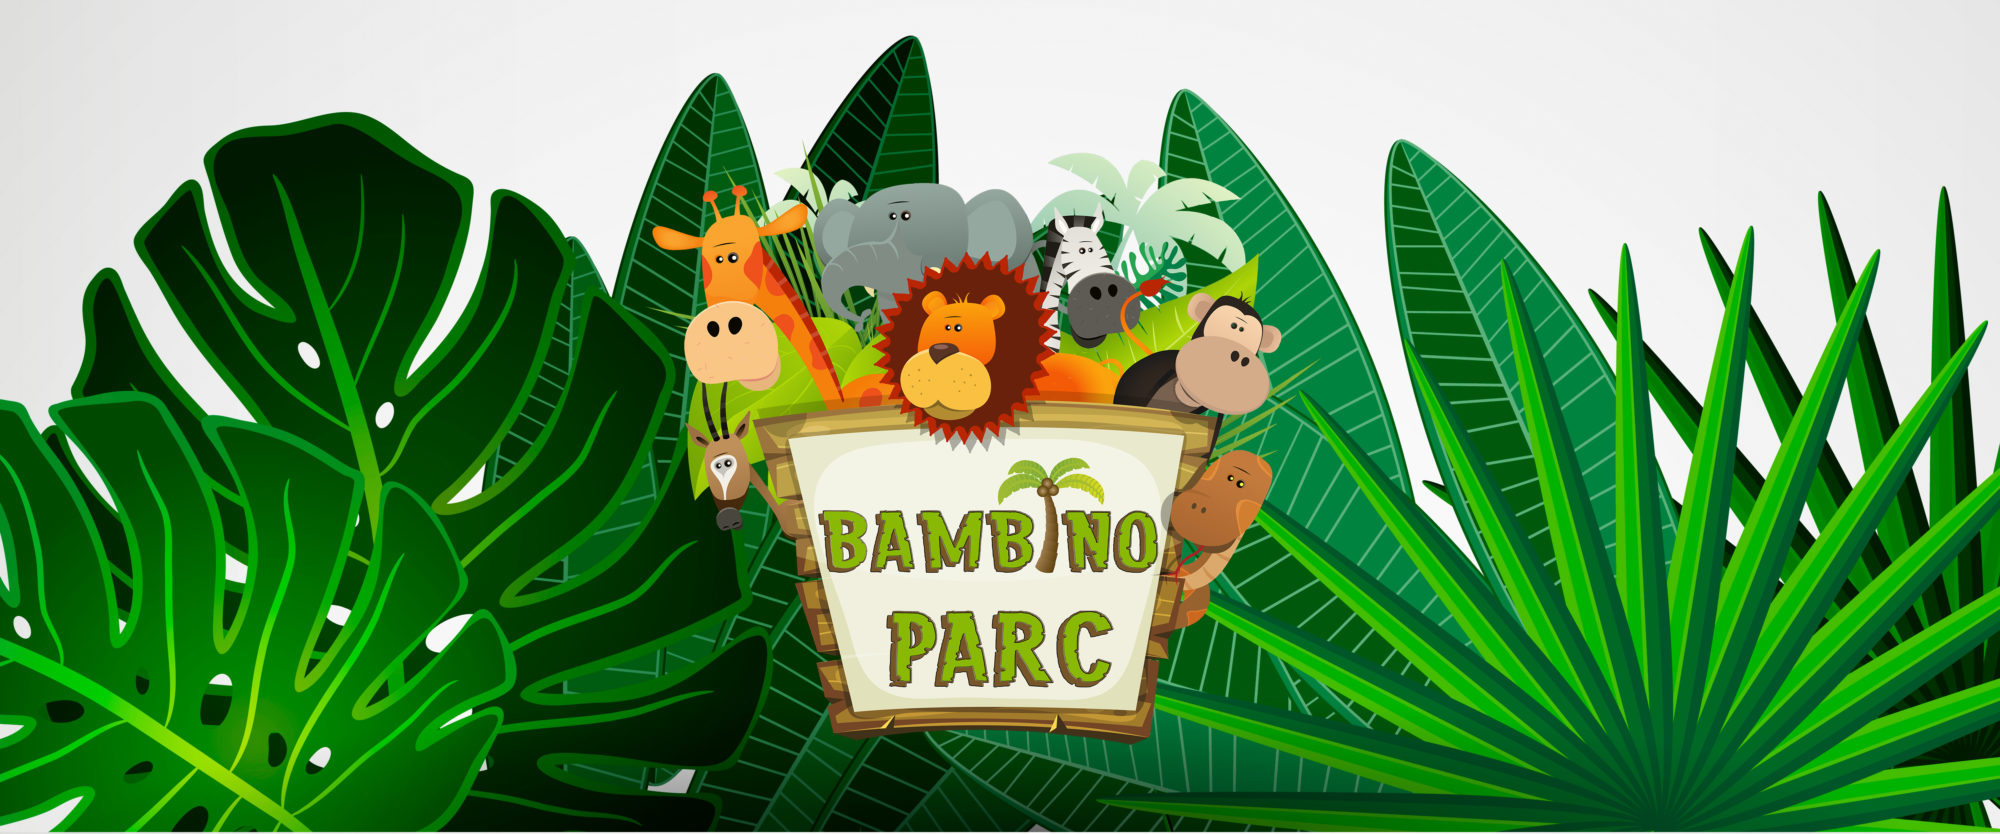 BAMBINO PARC